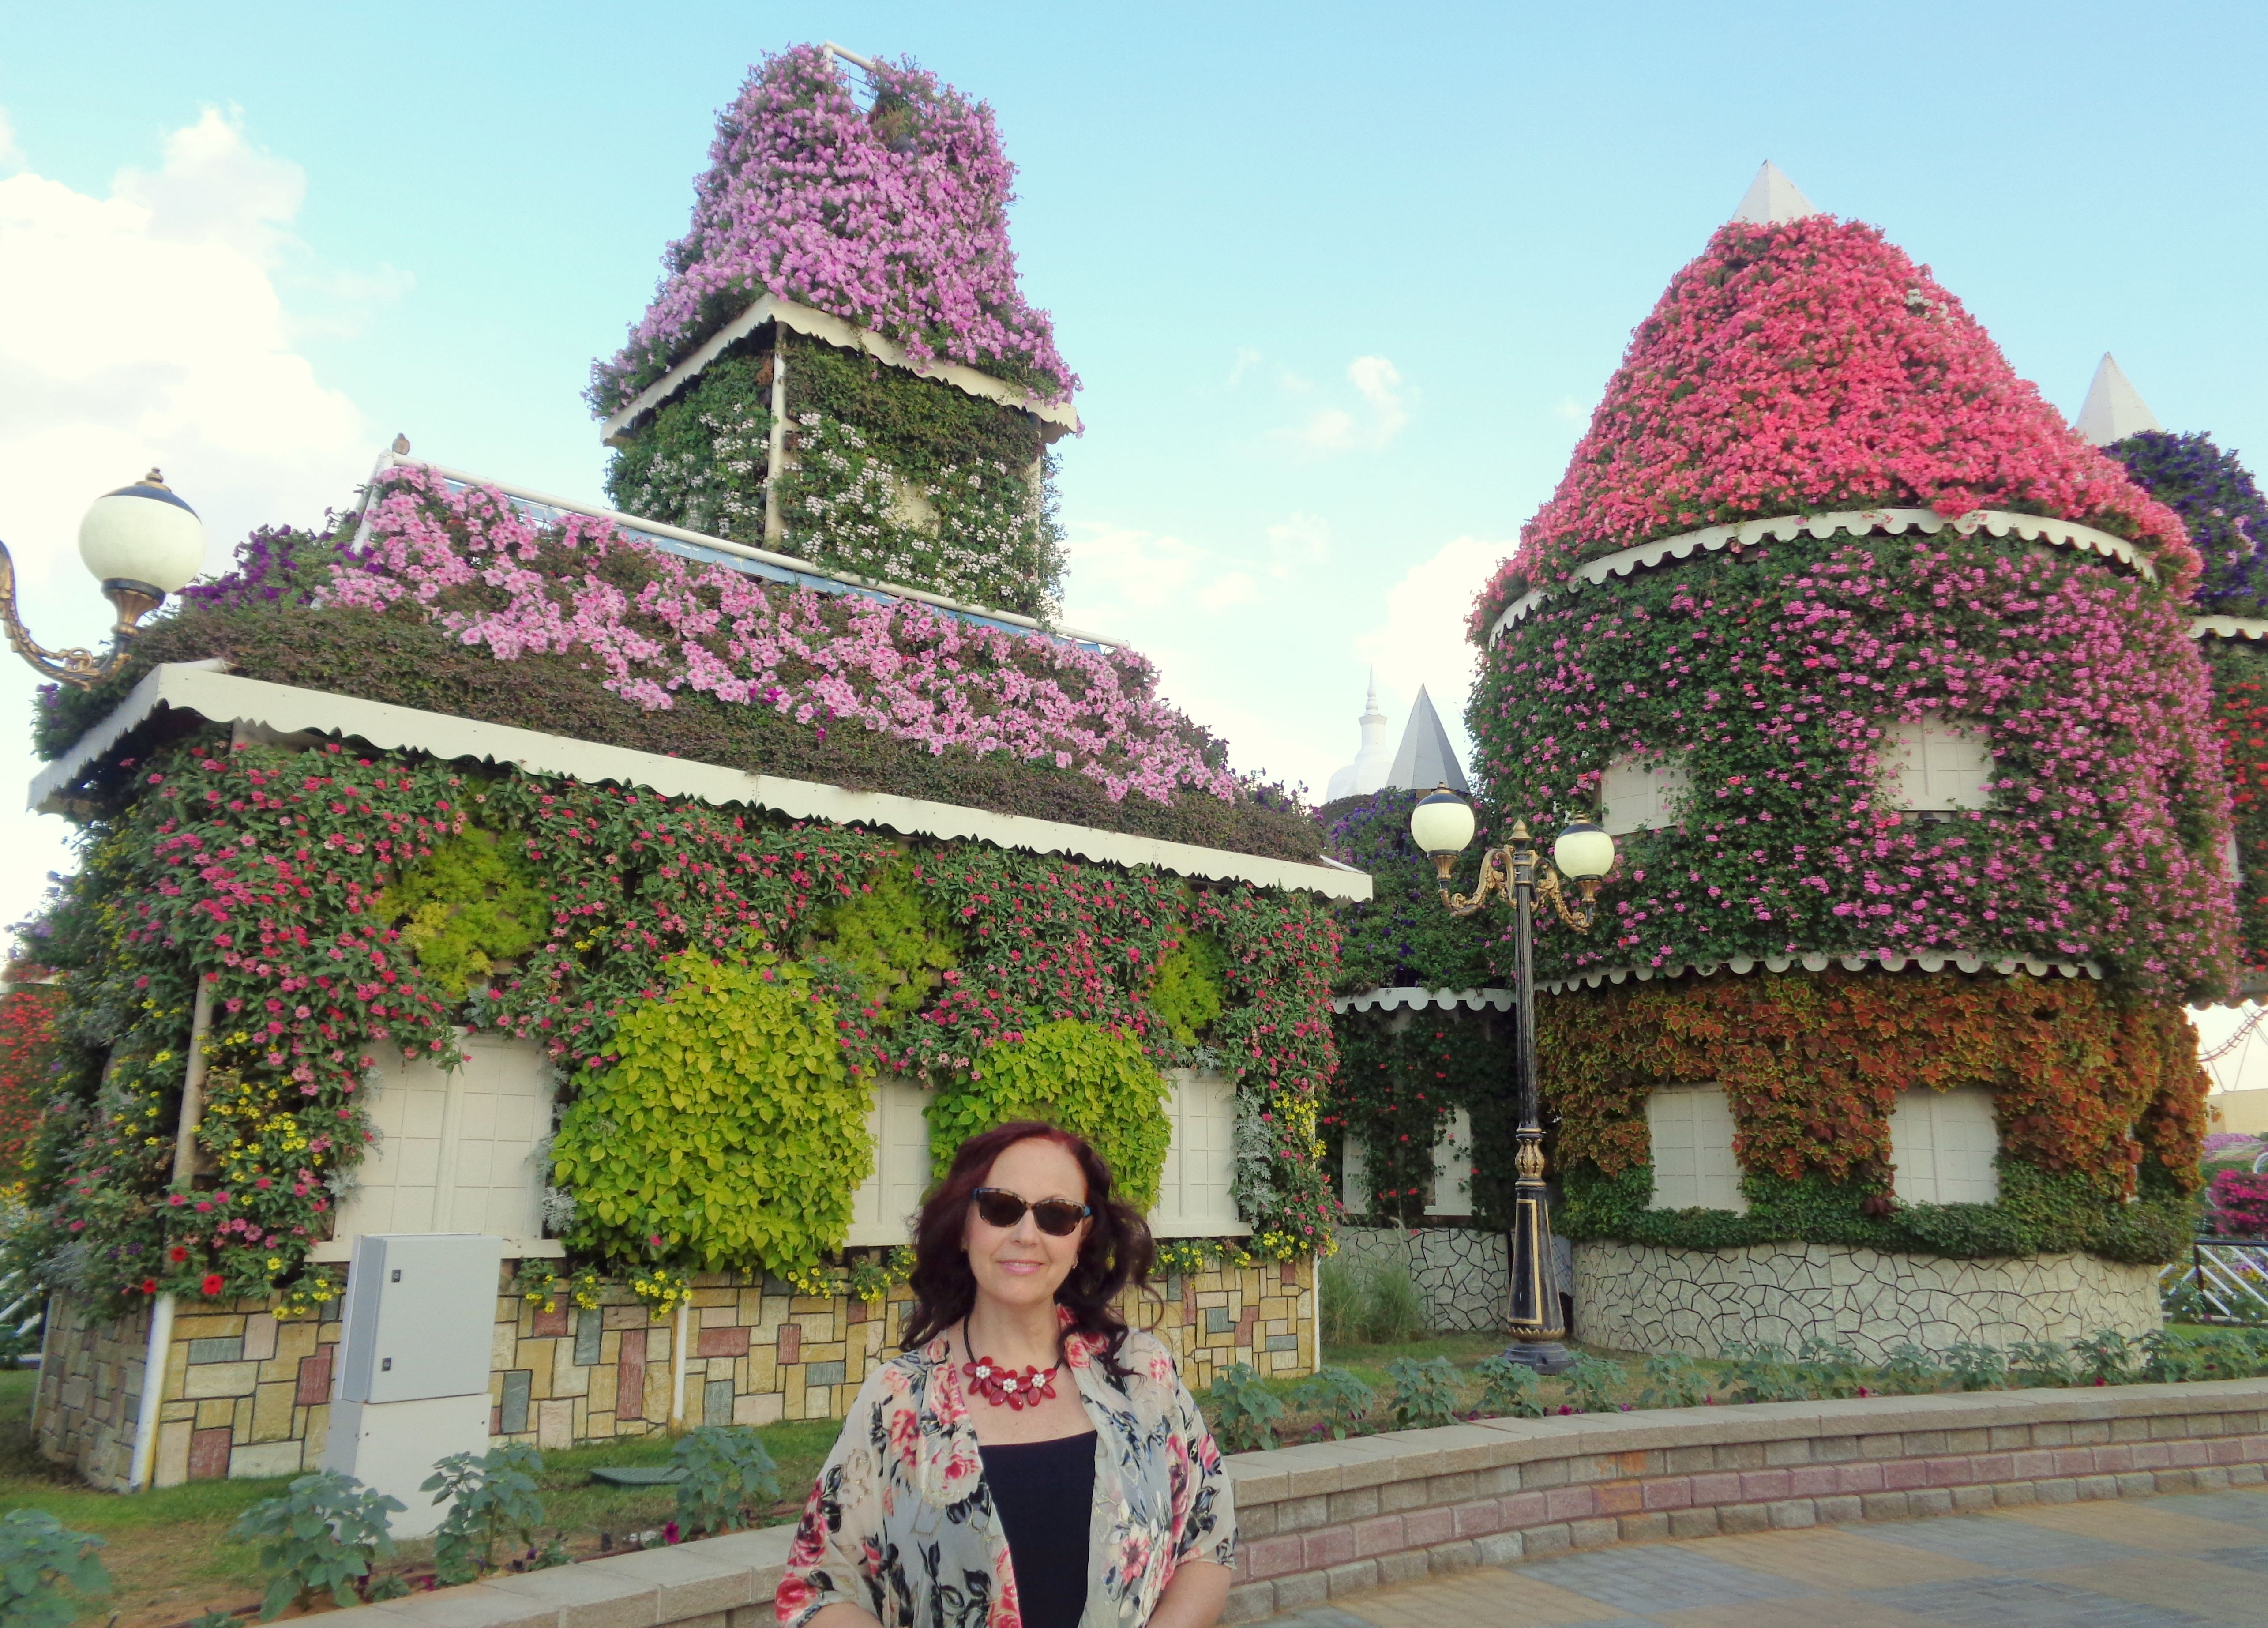 The Dubai Miracle Garden, Al Barsha South Third, Dubailand